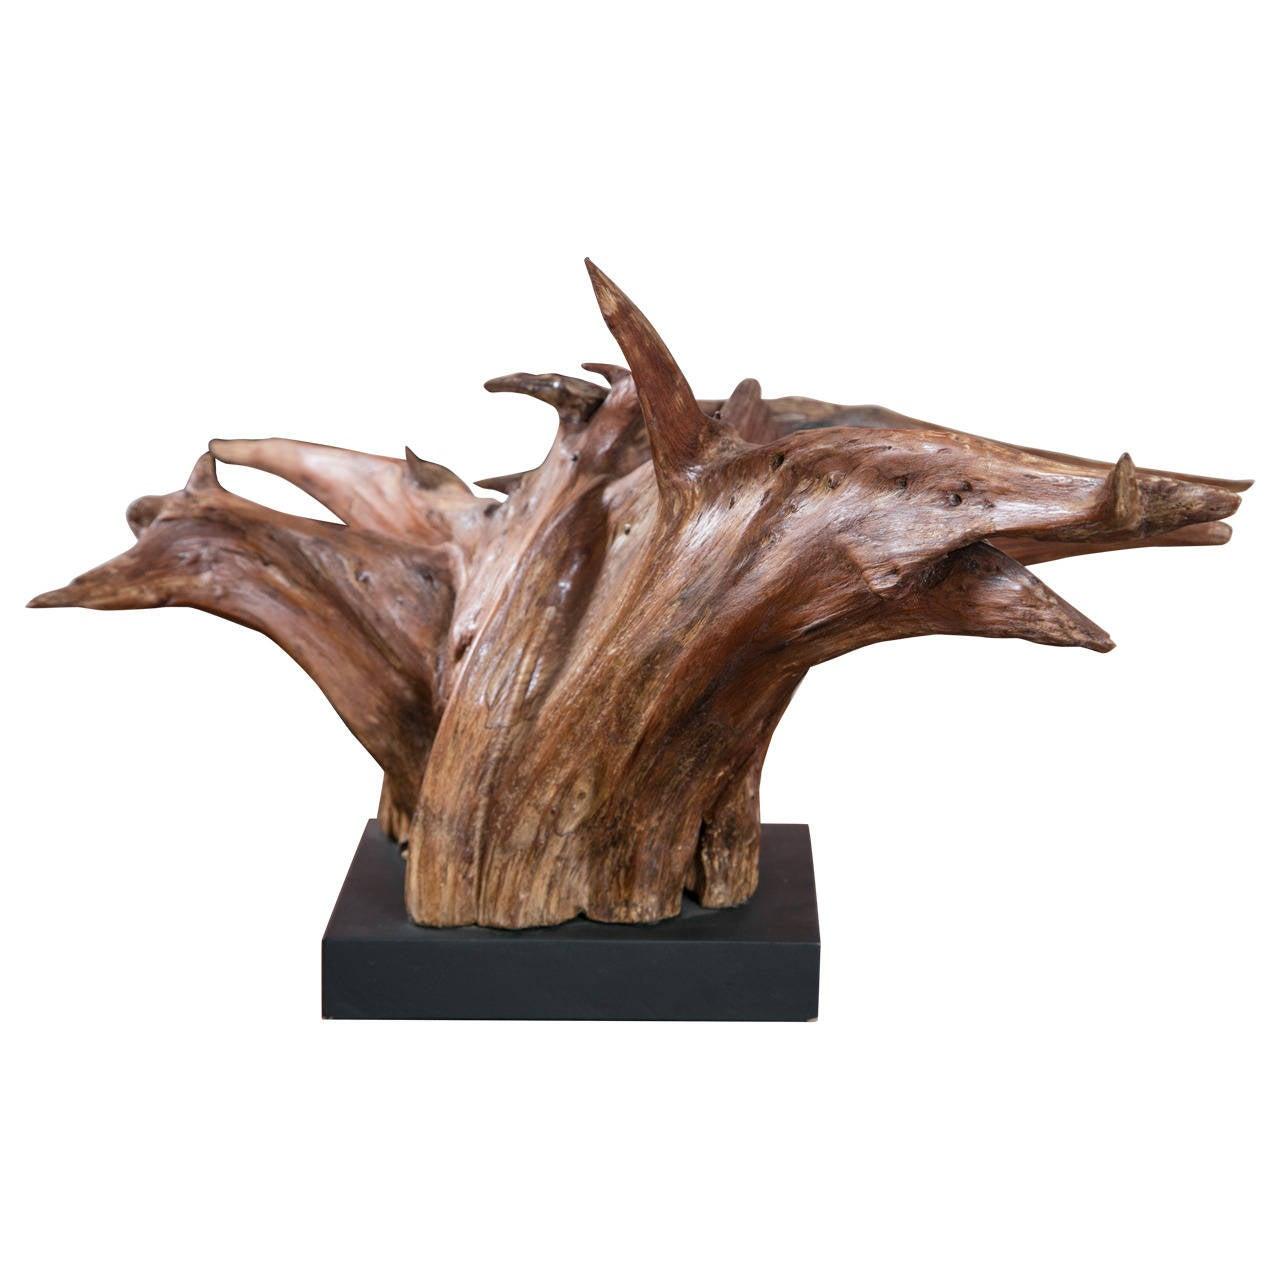 Mounted Driftwood Sculpture At 1stdibs